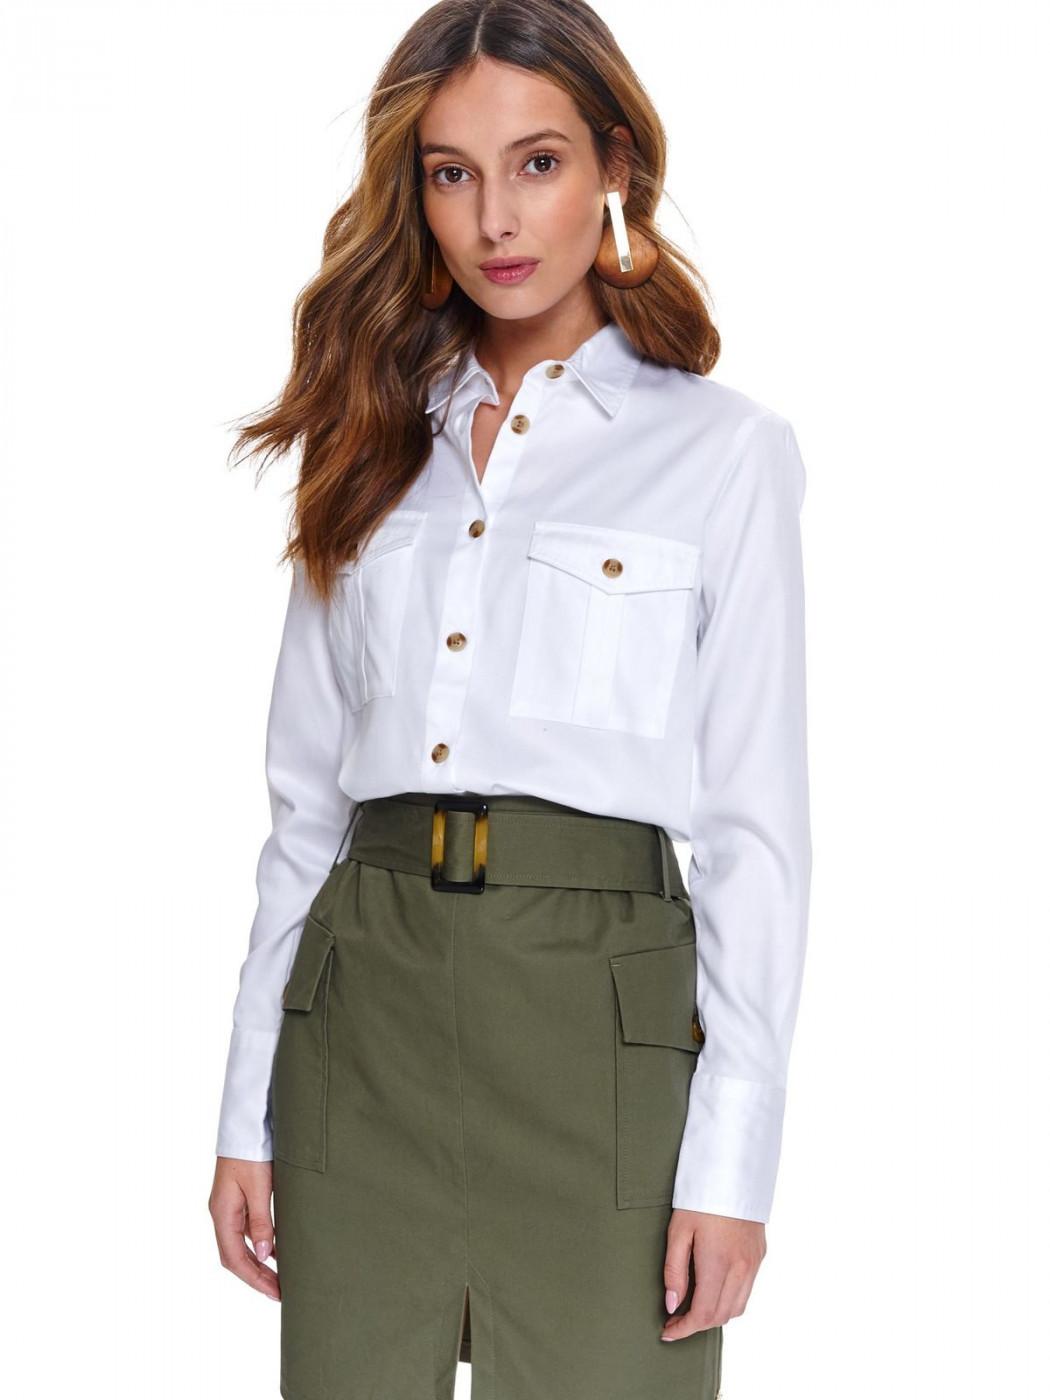 Women's shirt Top Secret Monochrome